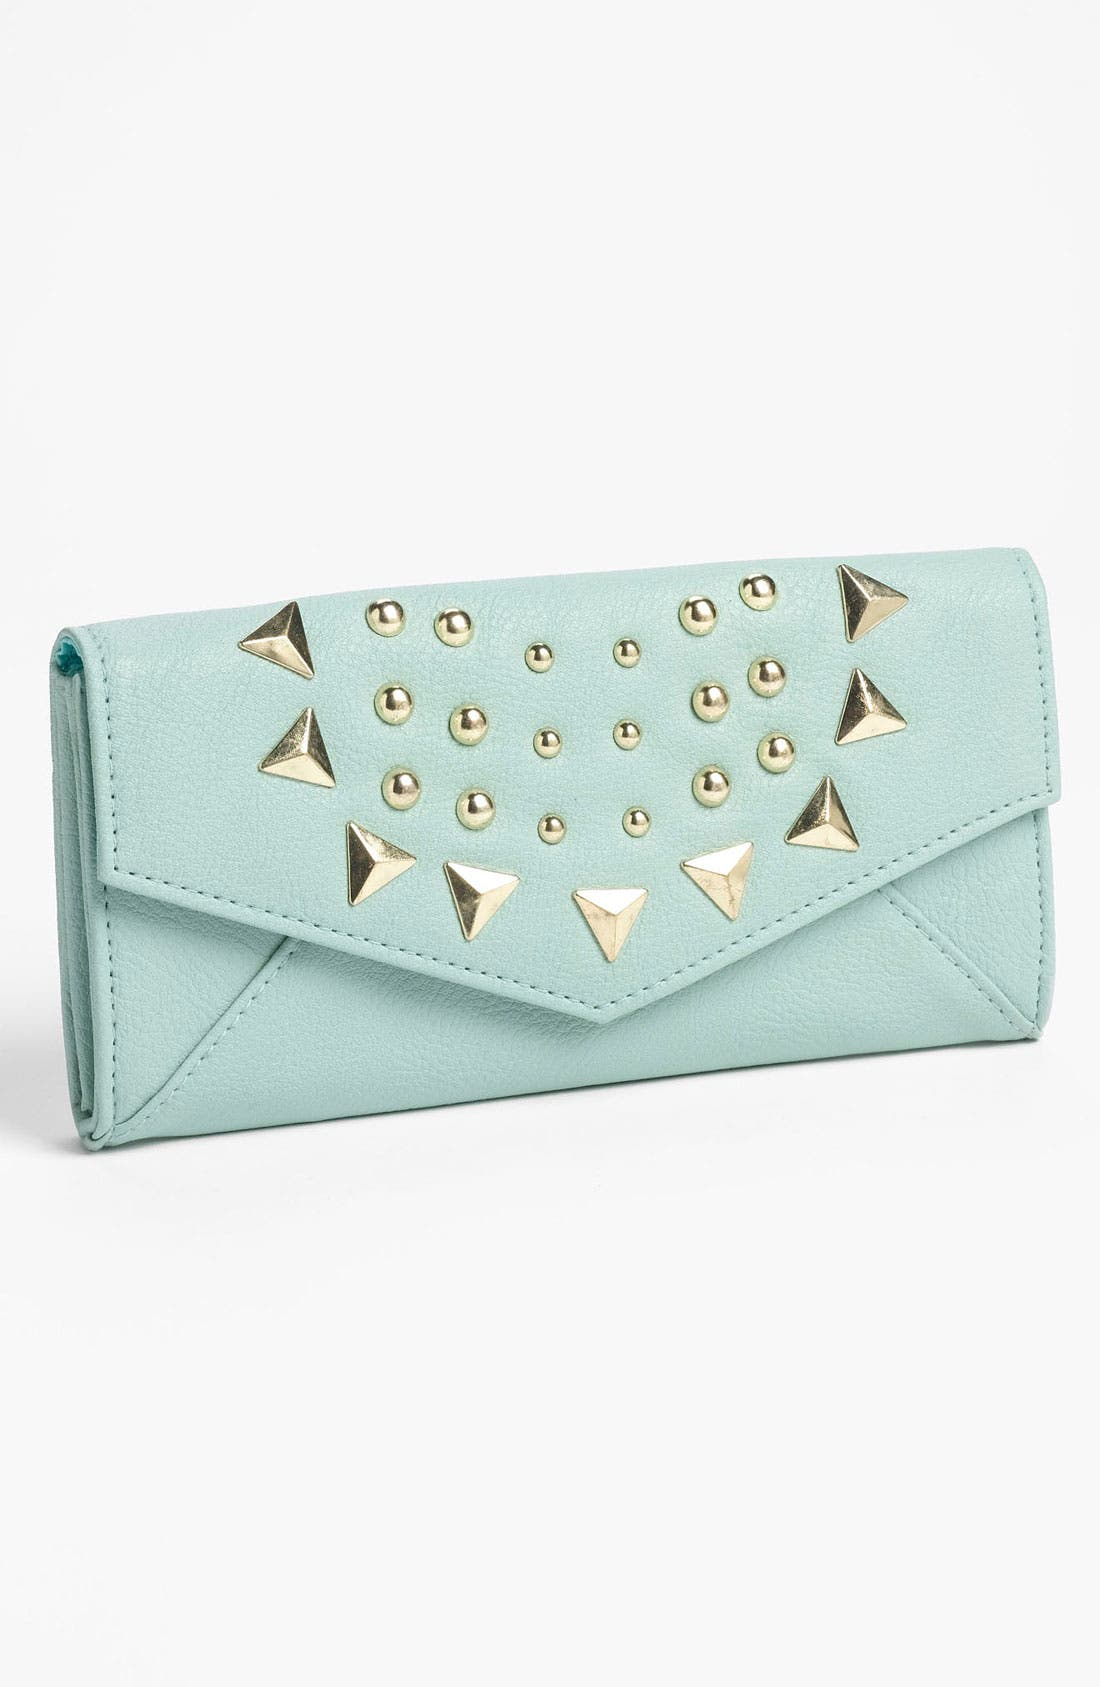 Alternate Image 1 Selected - Lulu Studded Envelope Wallet